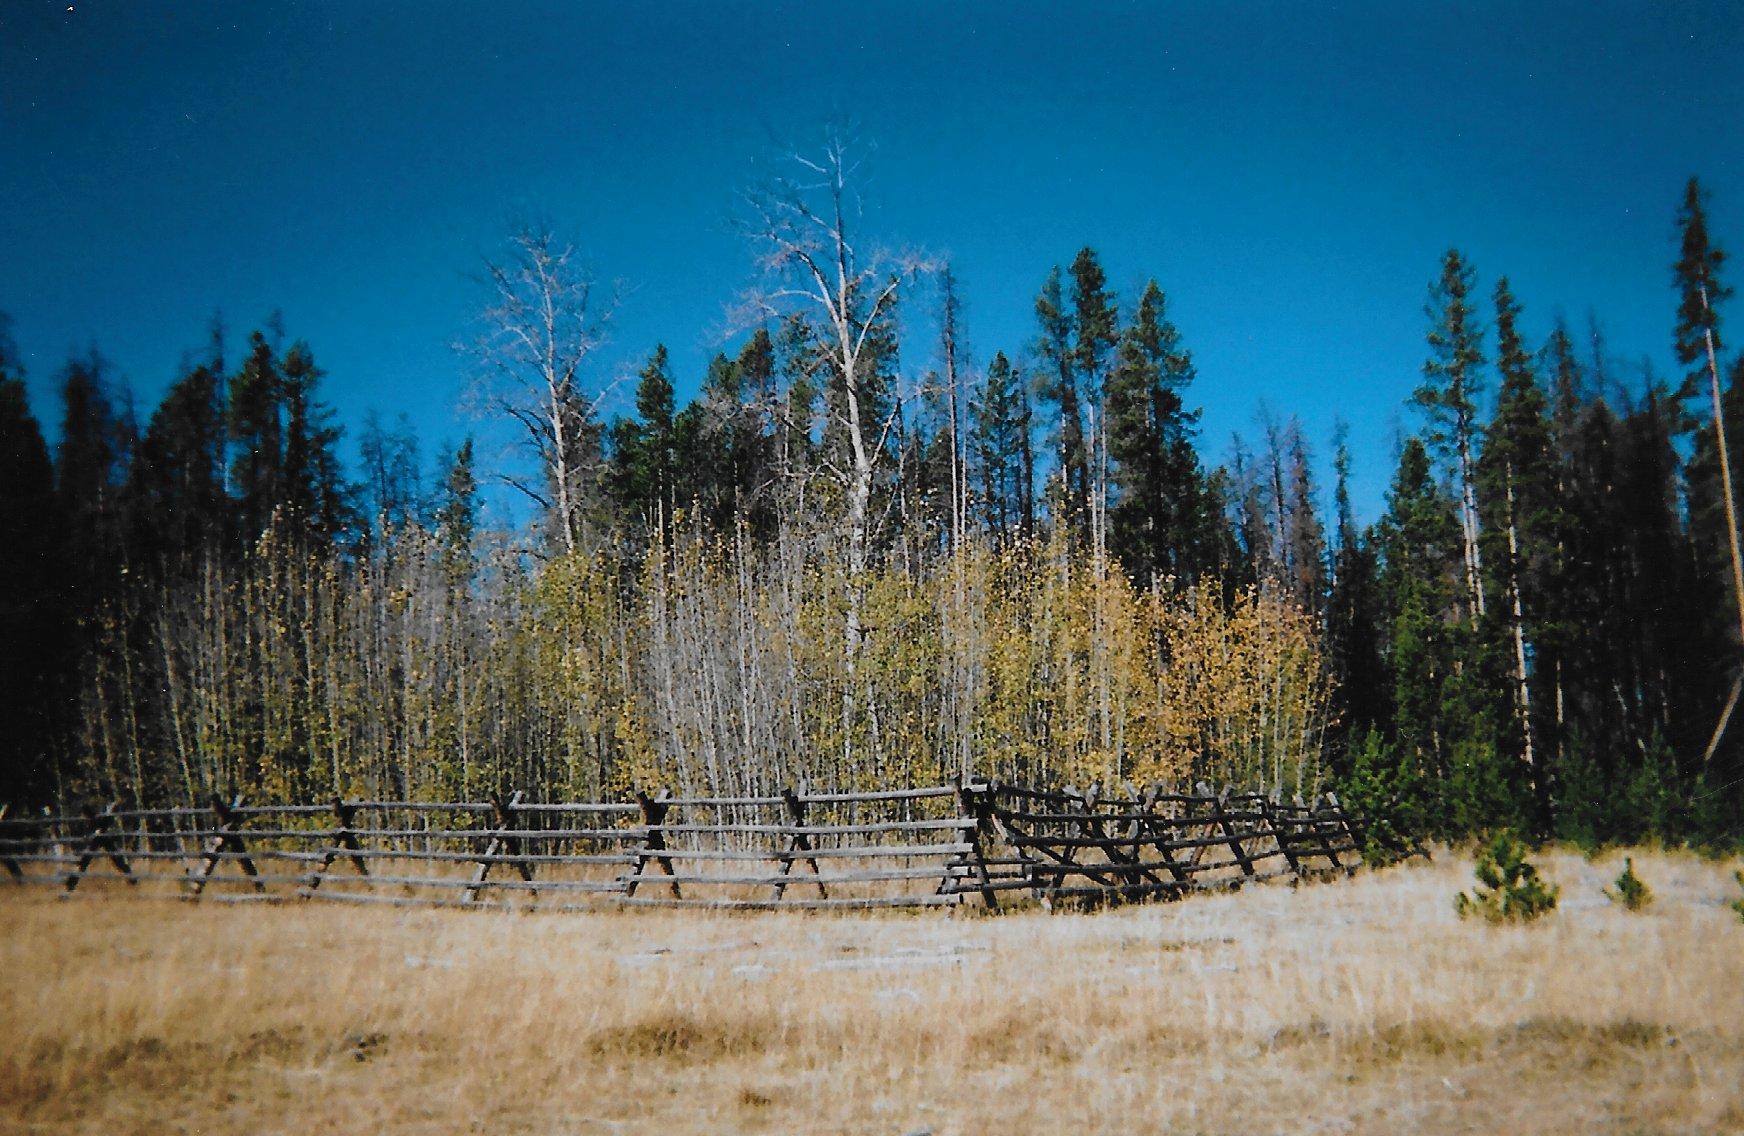 Aspen tree decline in West due to cattle grazing